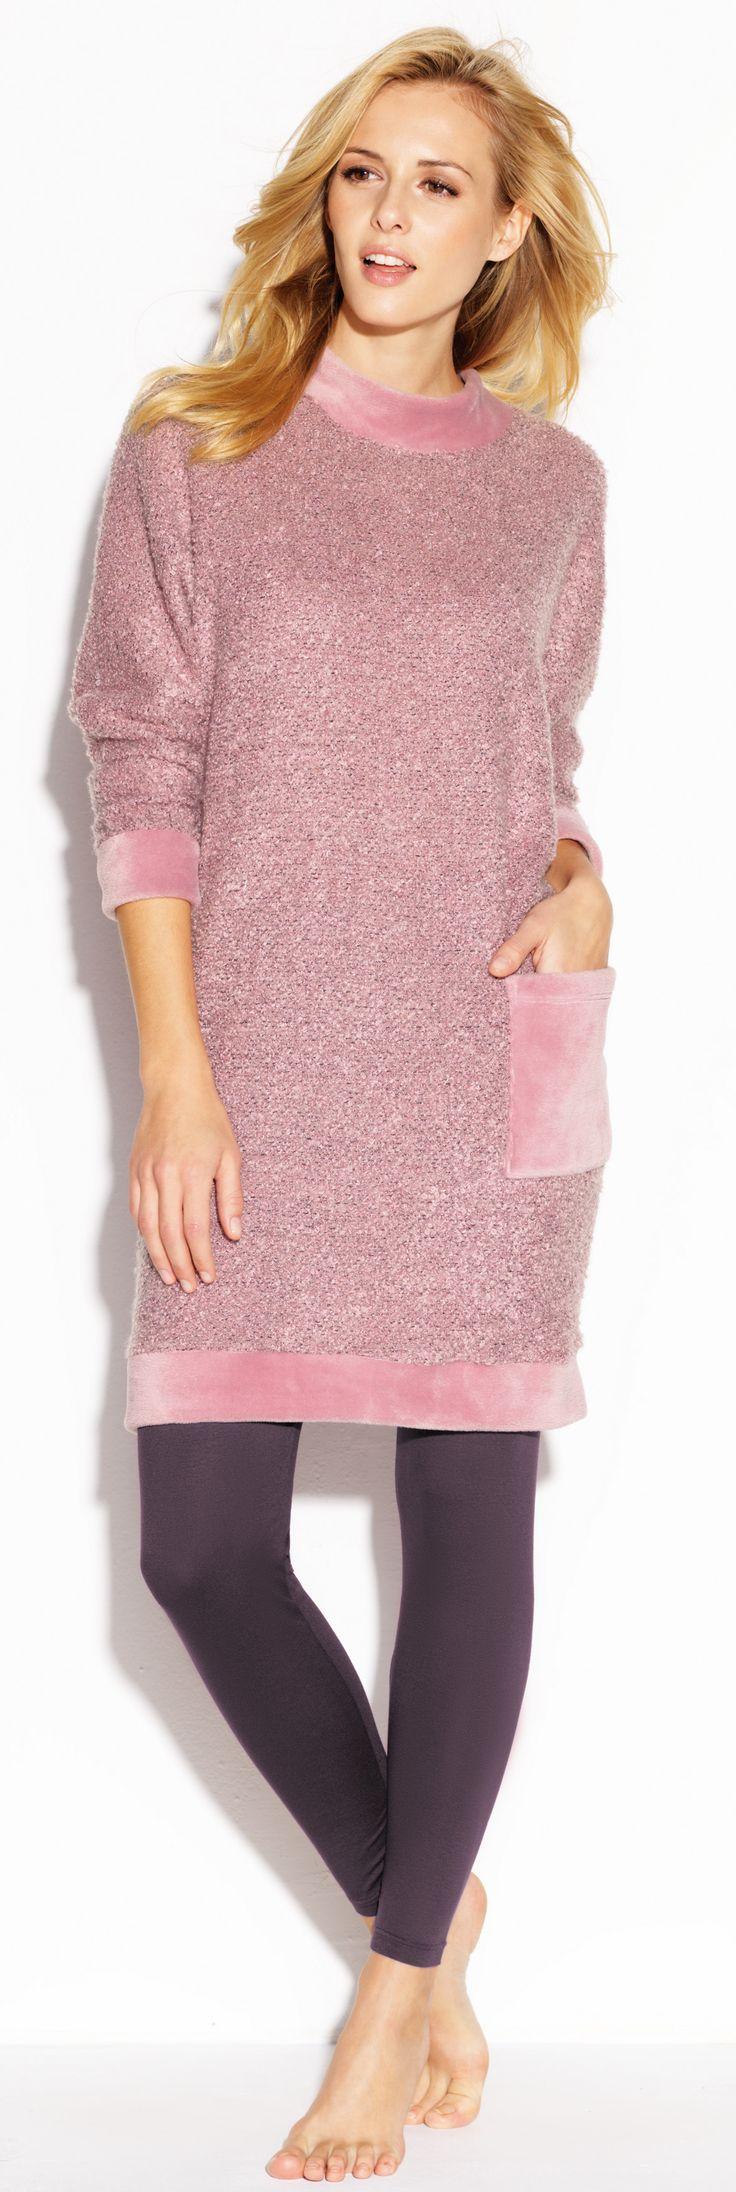 CYBÈLE Podzim-Zima 2015/2016 | Volnočasové prádlo | Šaty | Legíny | Loungewear | Dress | Leggings | www.naturana-plavky-pradlo.cz